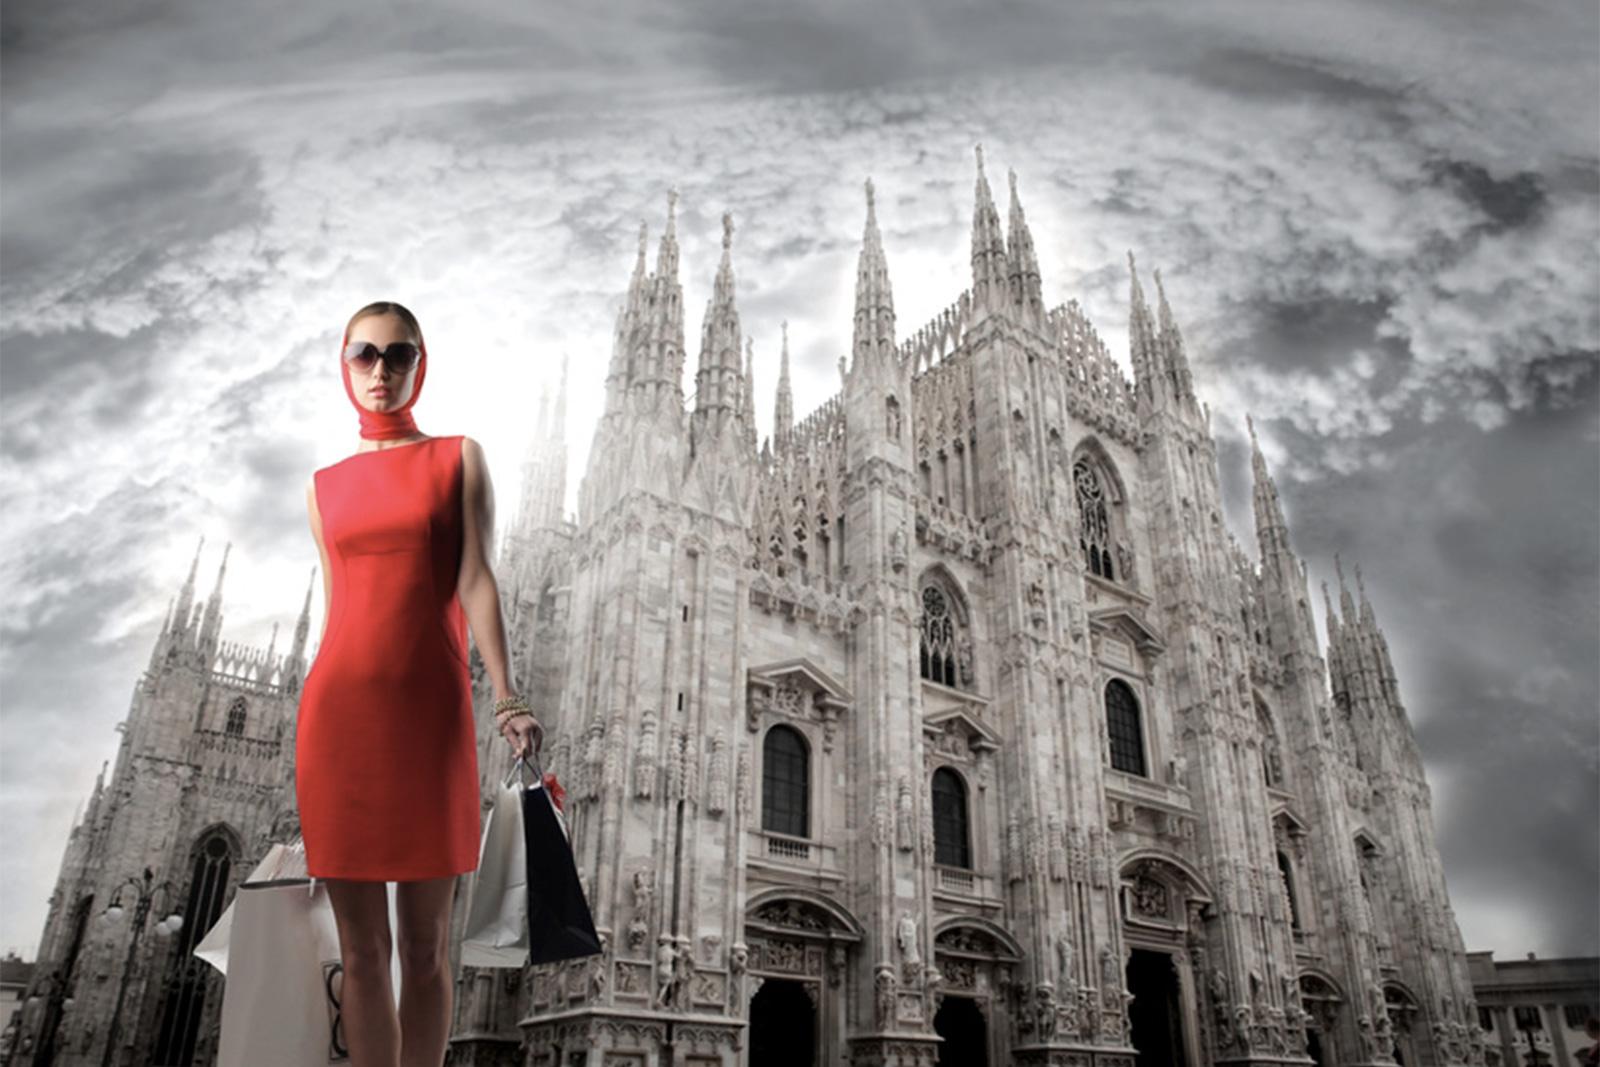 Fashion & Food: Milan and Italian Lake Experience 7-day